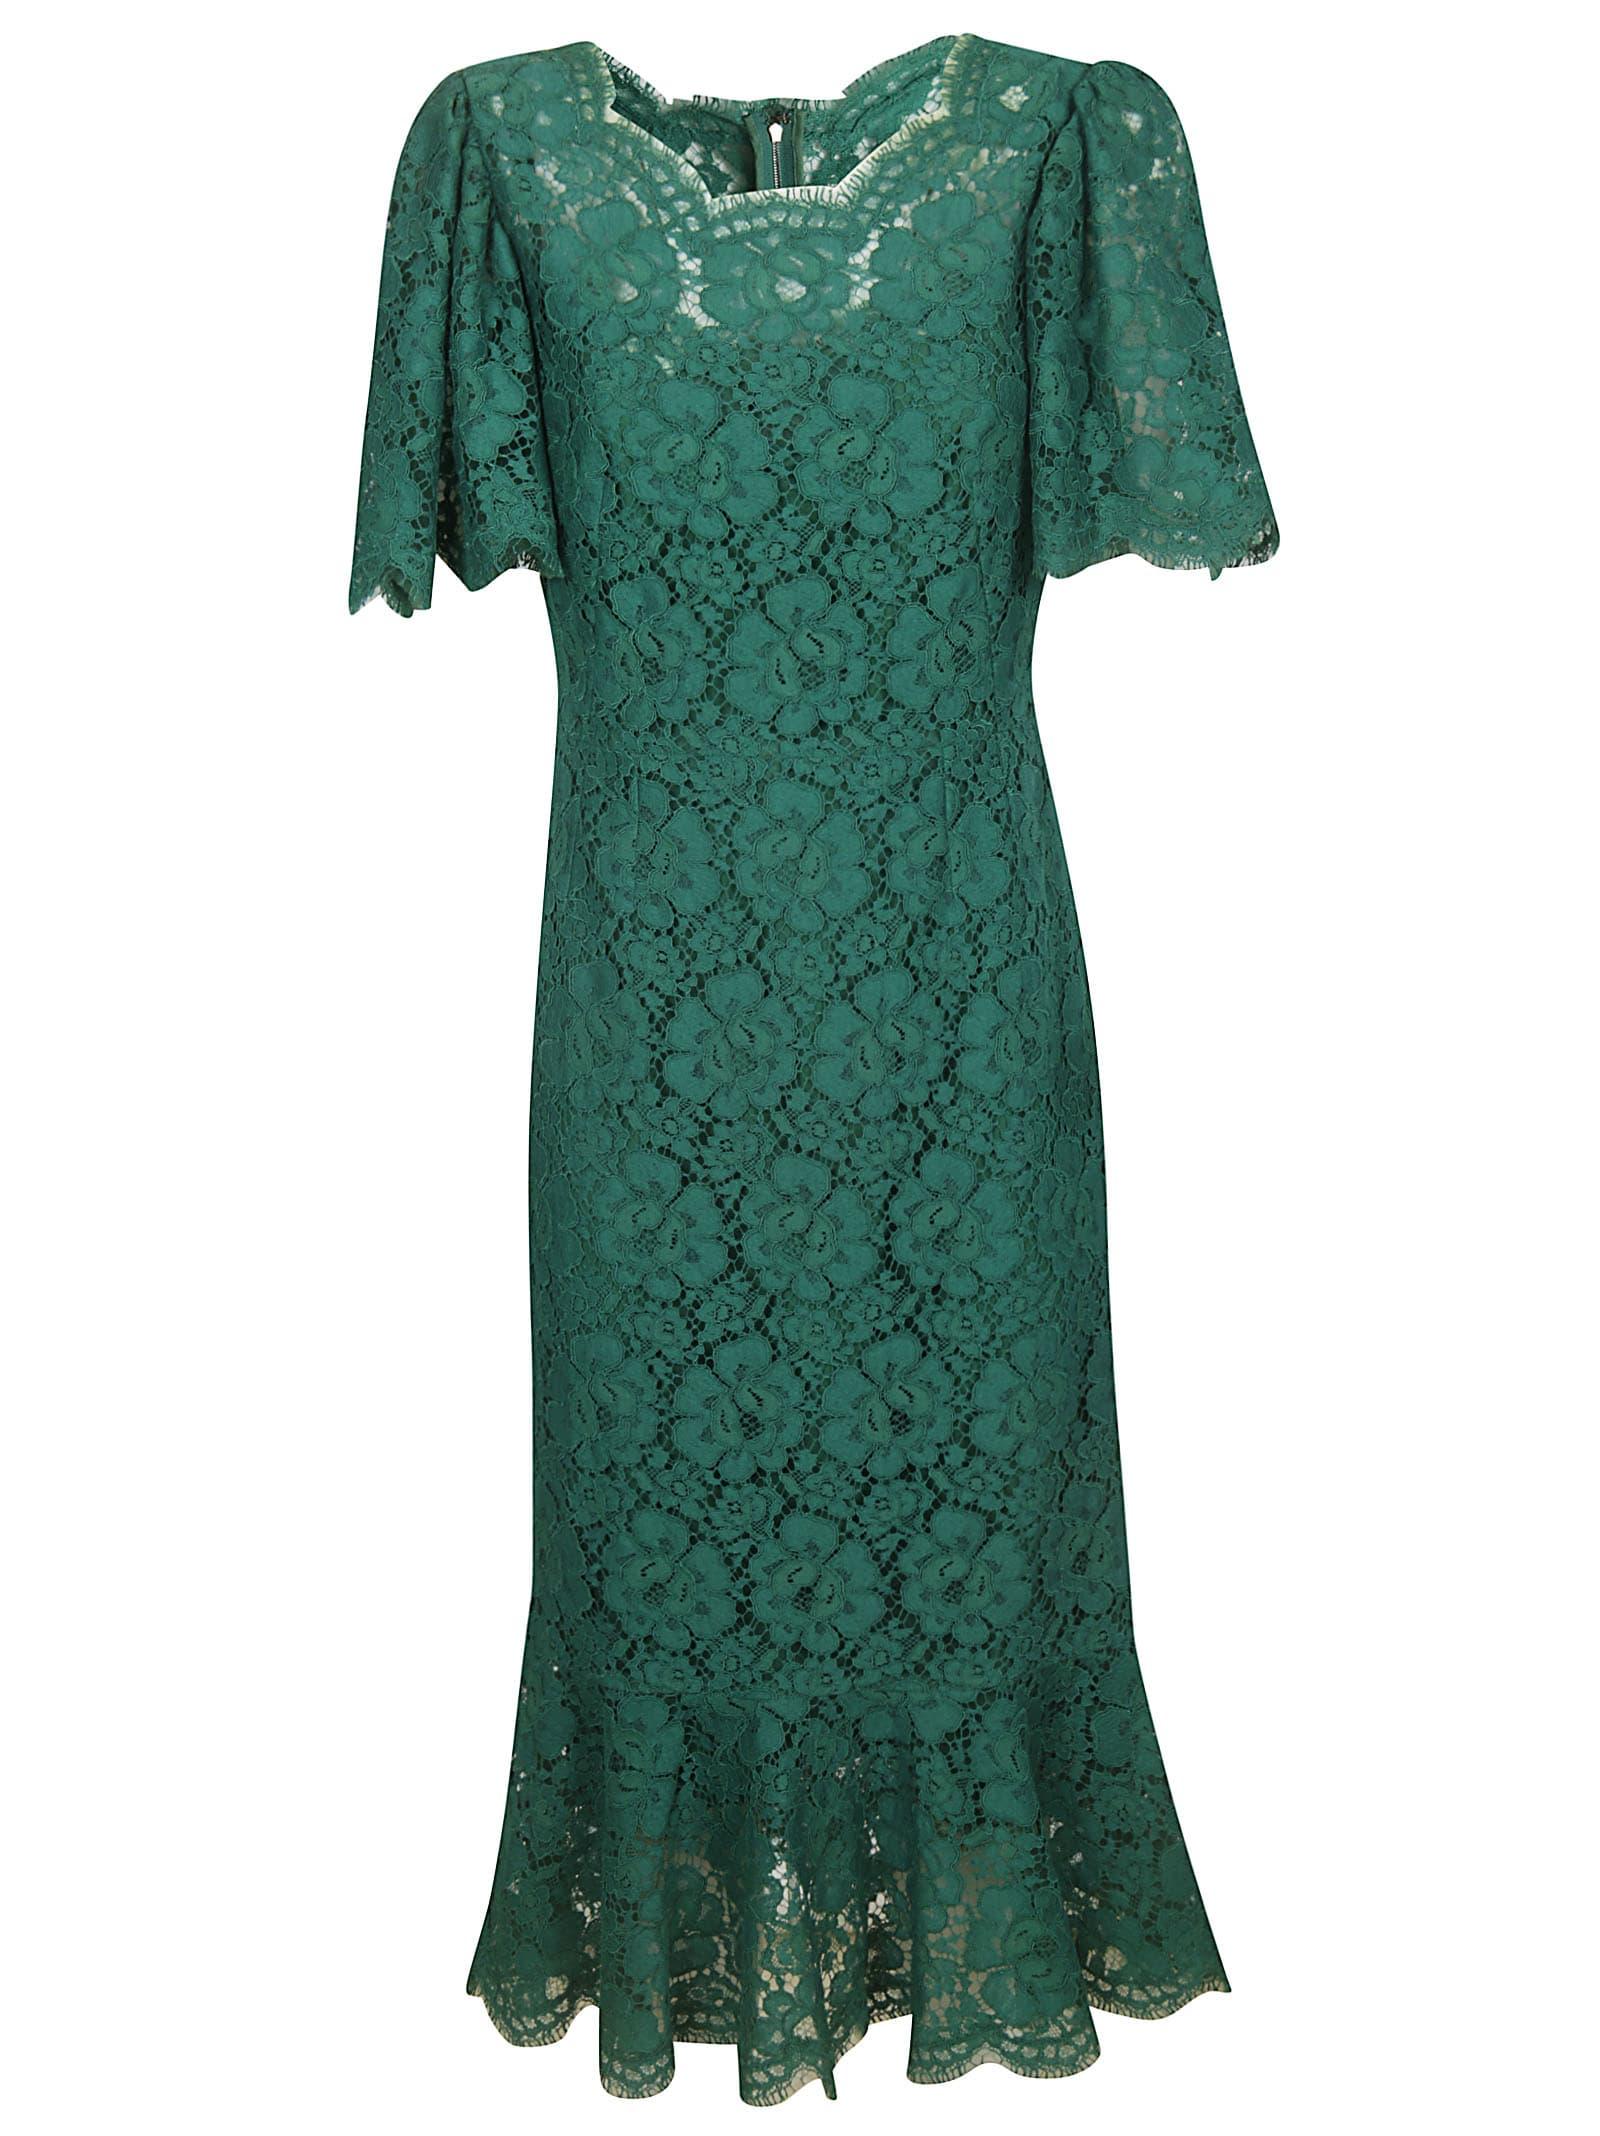 Photo of  Dolce & Gabbana Floral Lace Dress- shop Dolce & Gabbana  online sales